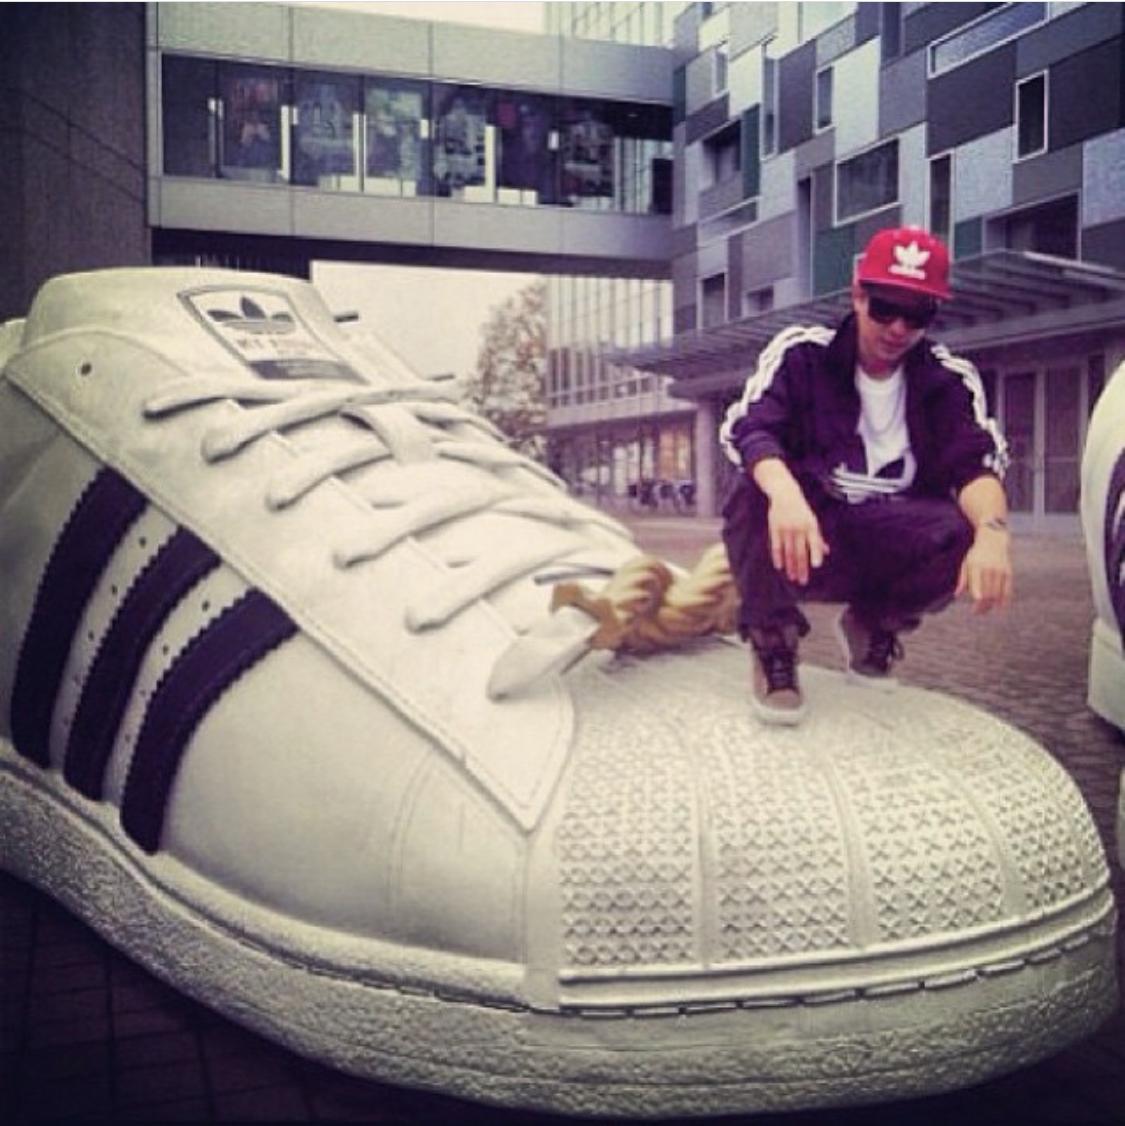 Alf Alpha @ Adidas HQ